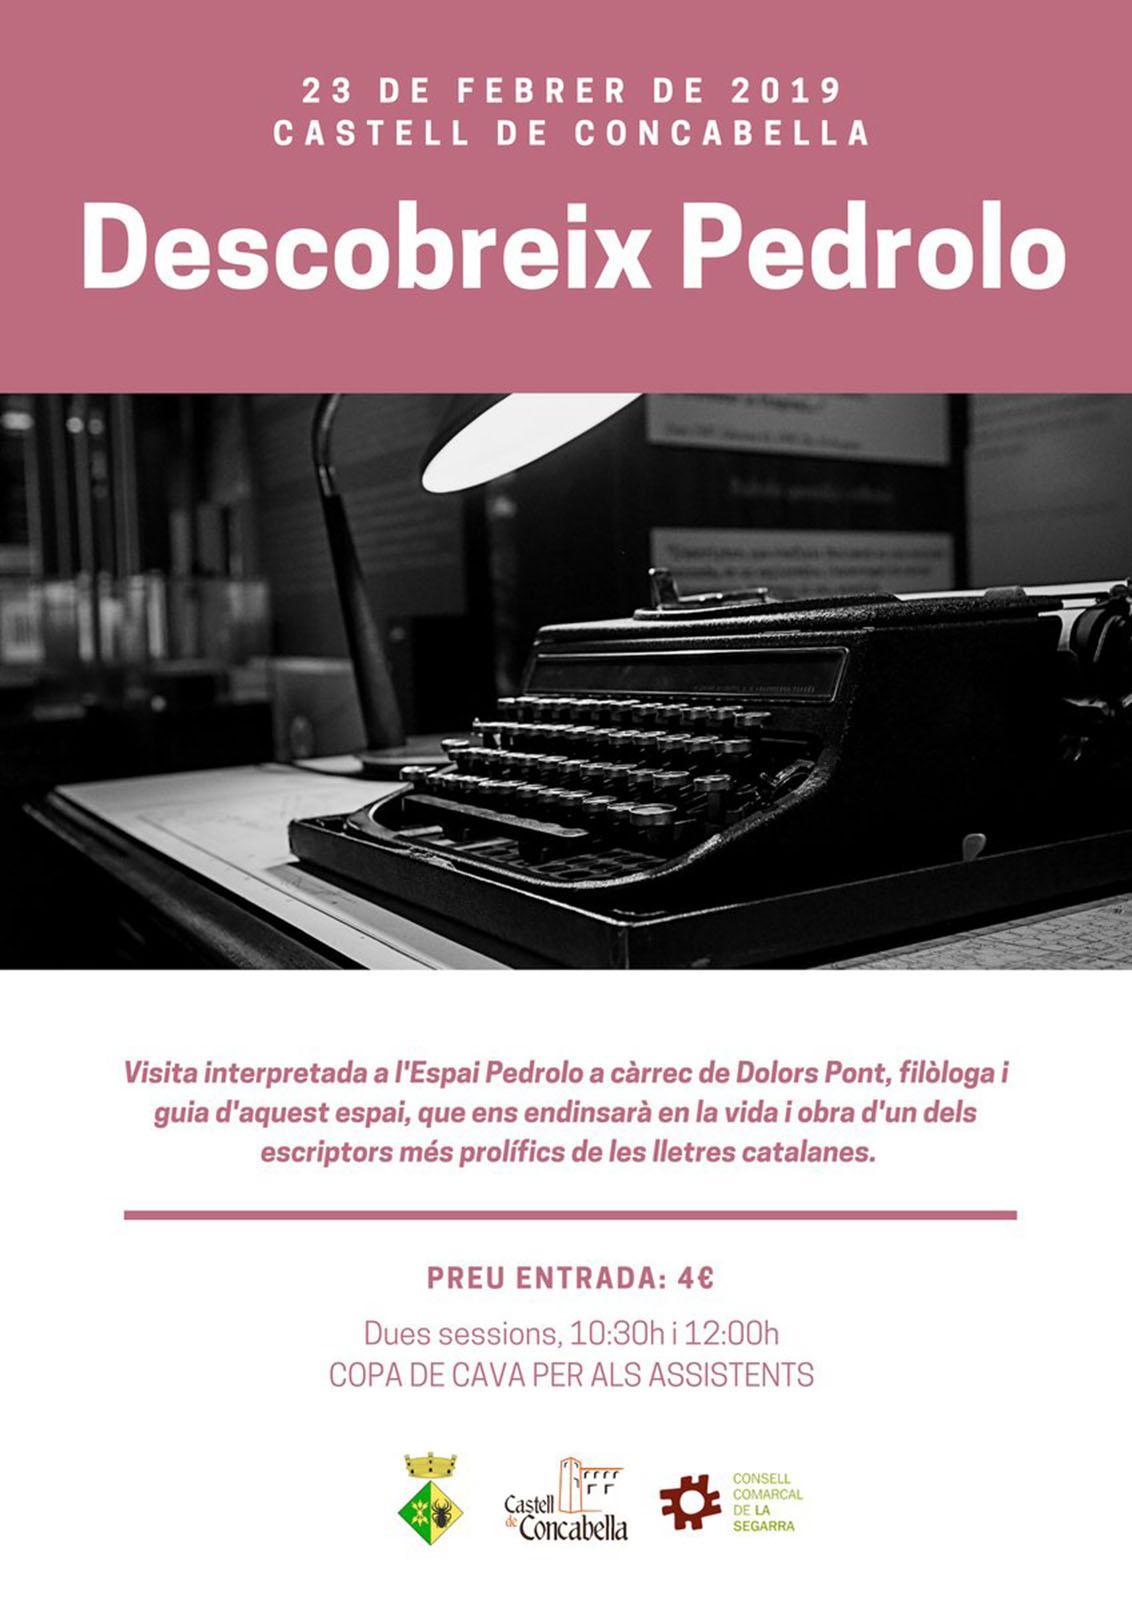 Visita interpretada a l'Espai Pedrolo